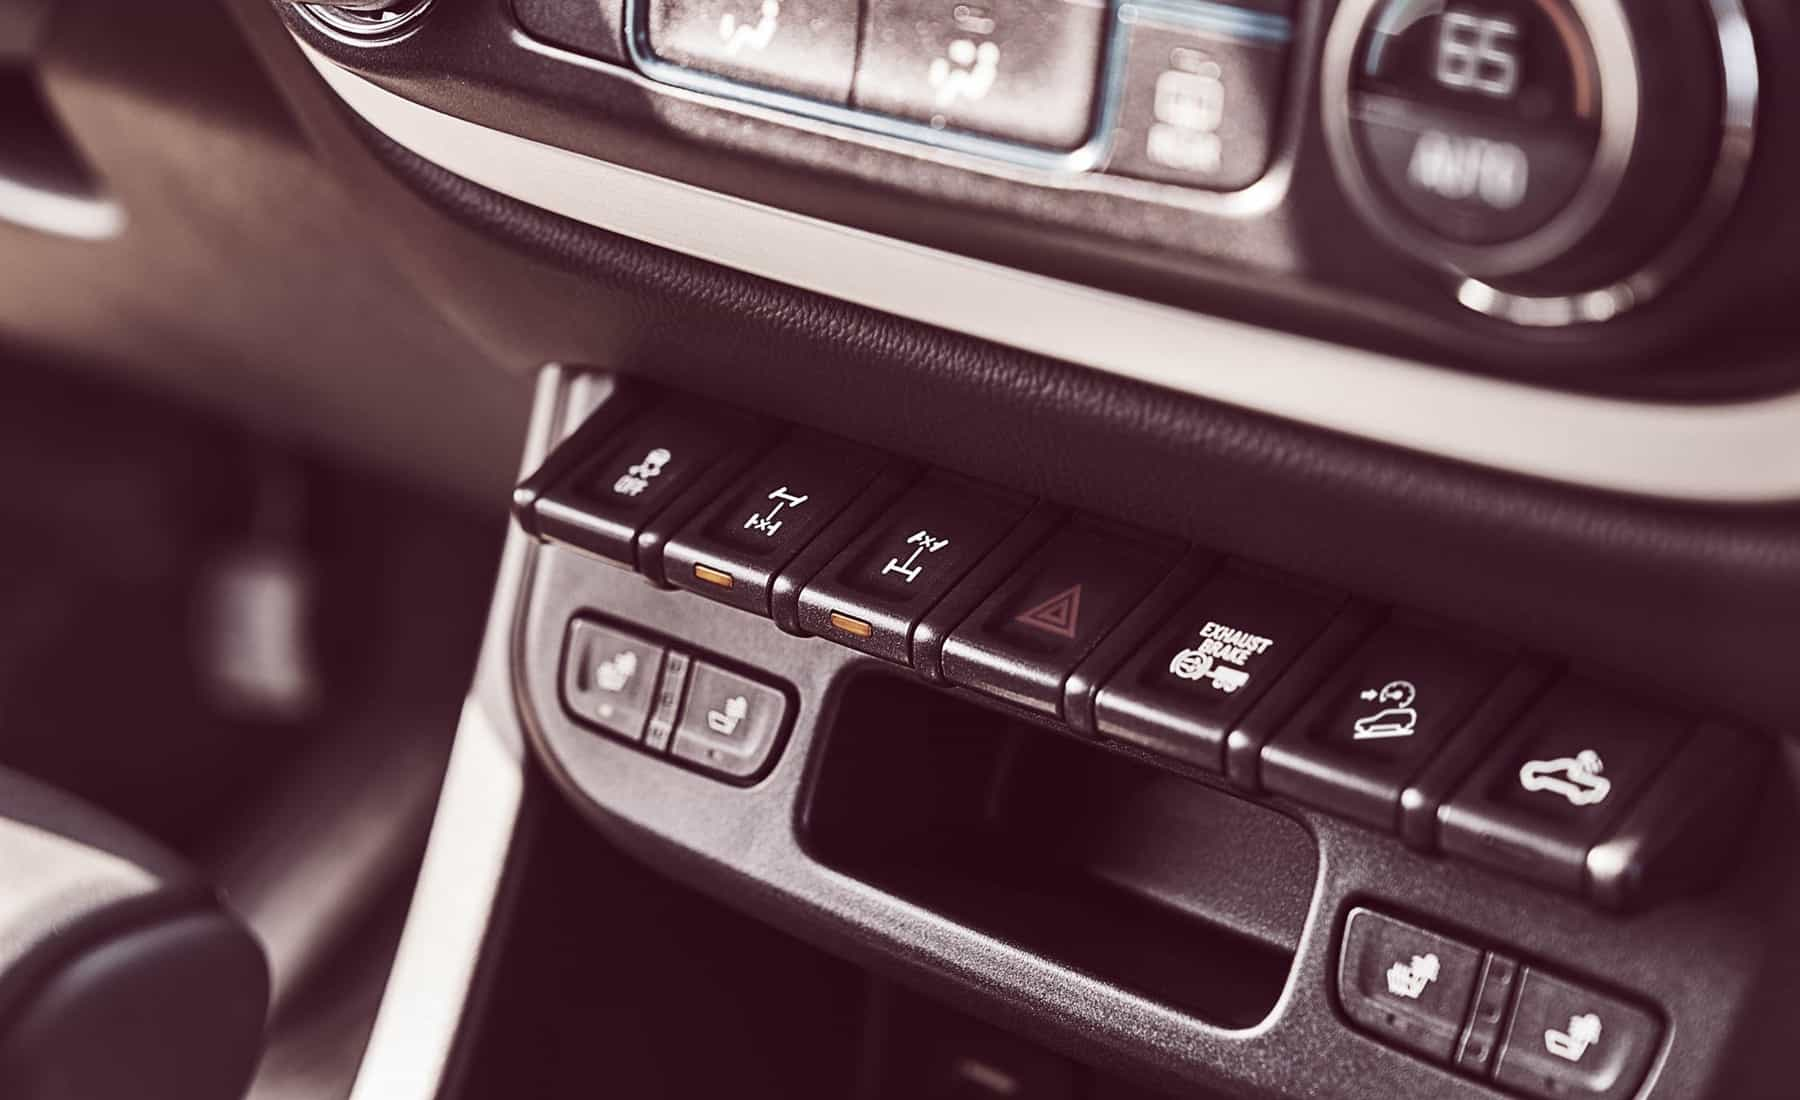 2017 Chevrolet Colorado ZR2 Crew Cab Diesel Interior View Control Instrument (View 8 of 16)